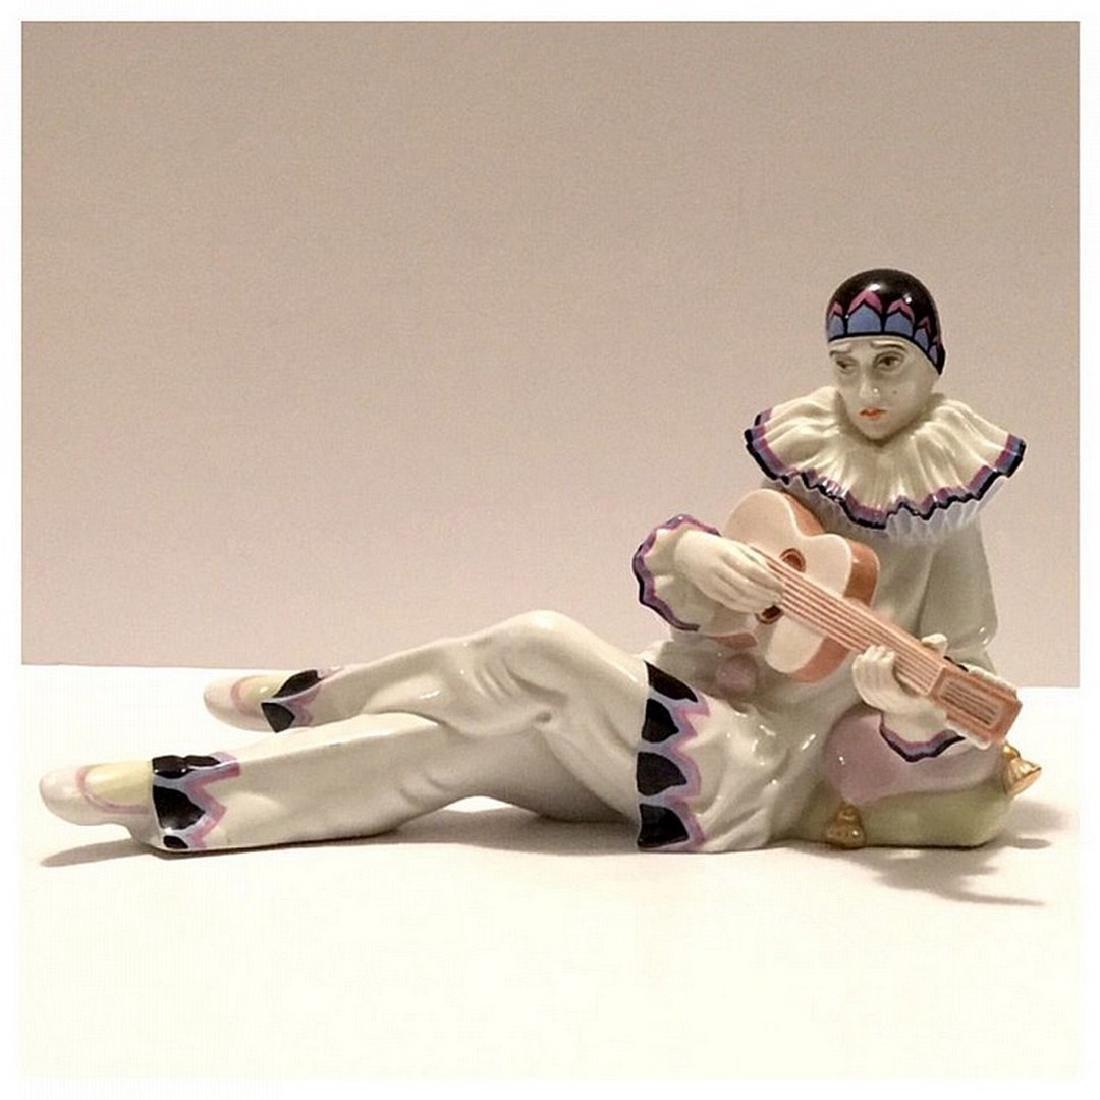 Rosenthal German porcelain Pierrot clown figure - 2